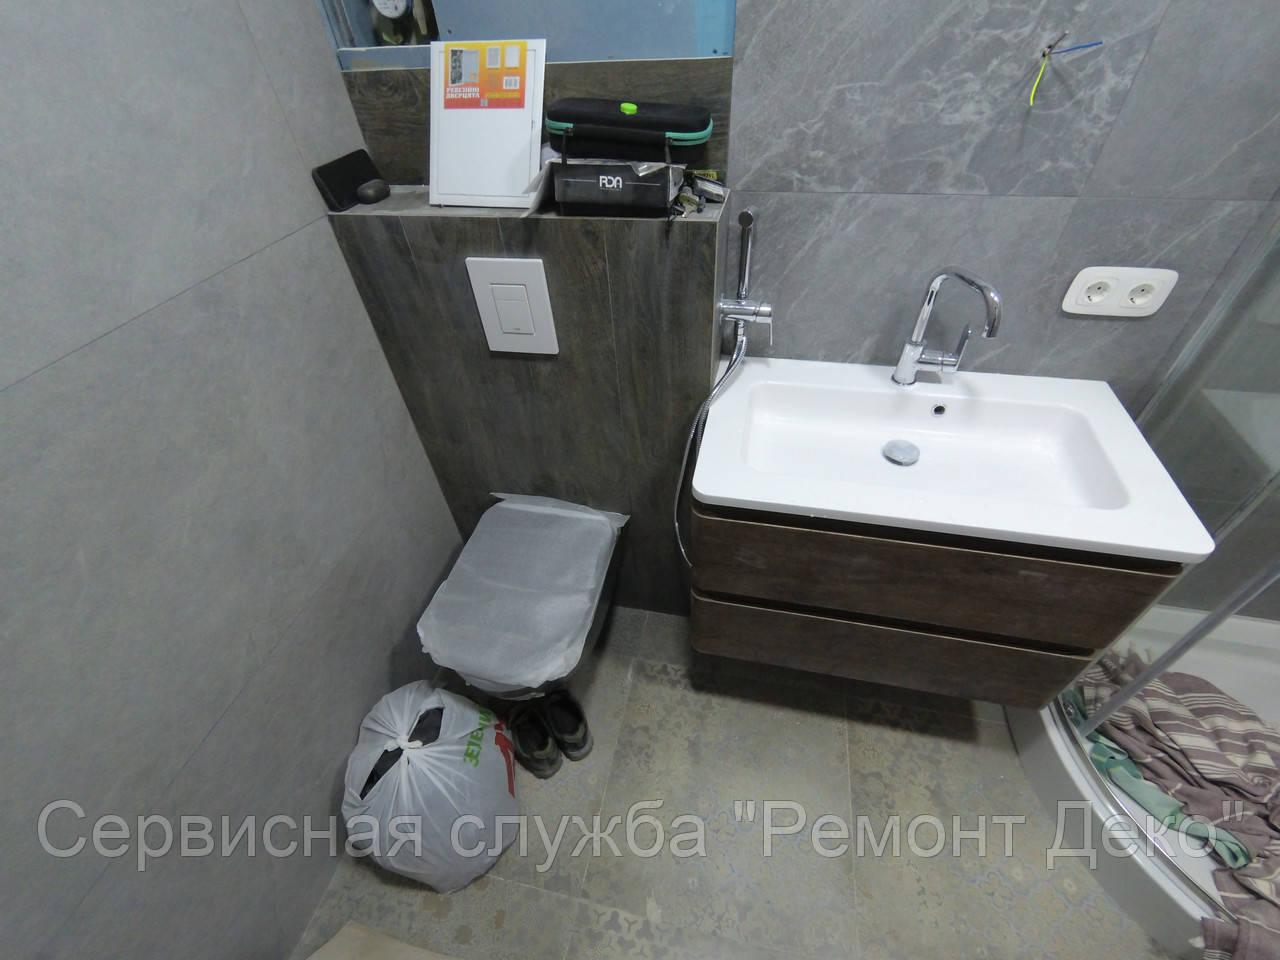 Услуги сантехника Павлоград. Вызов сантехника на дом в Павлограде. Хороший сантехник в Павлограде.